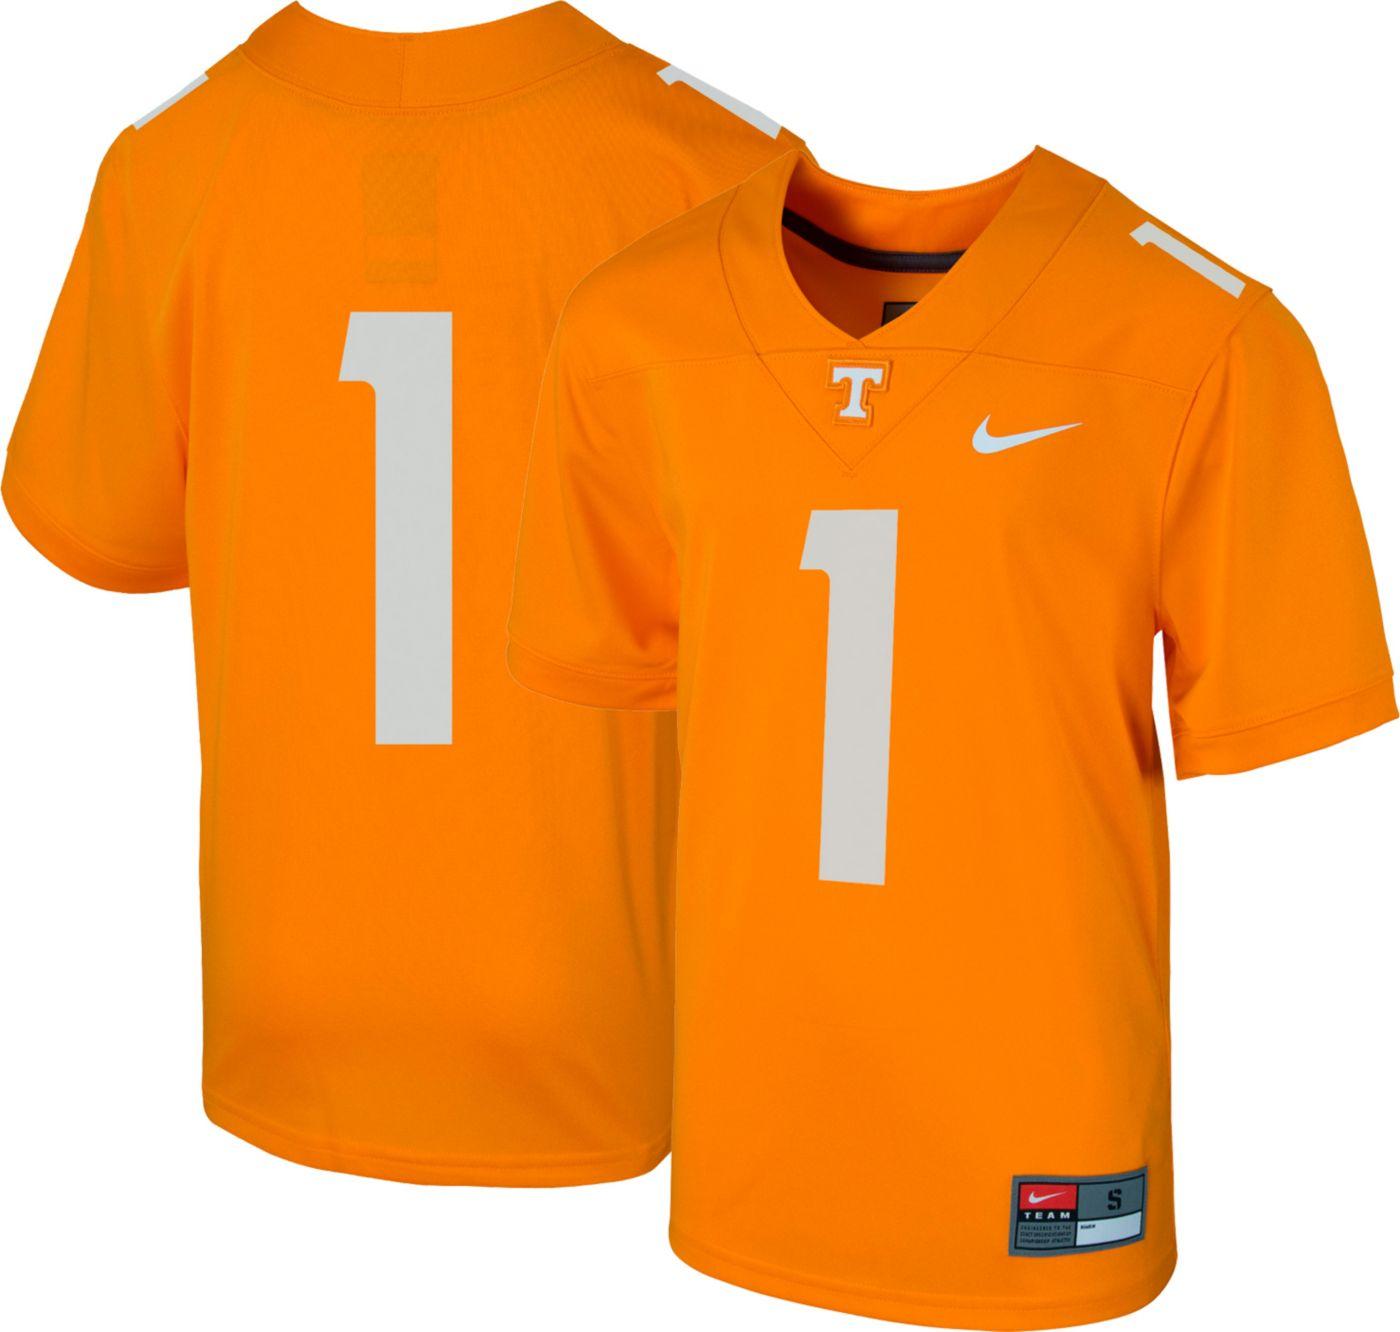 Nike Boys' Tennessee Volunteers #1 Tennessee Orange Replica Football Jersey